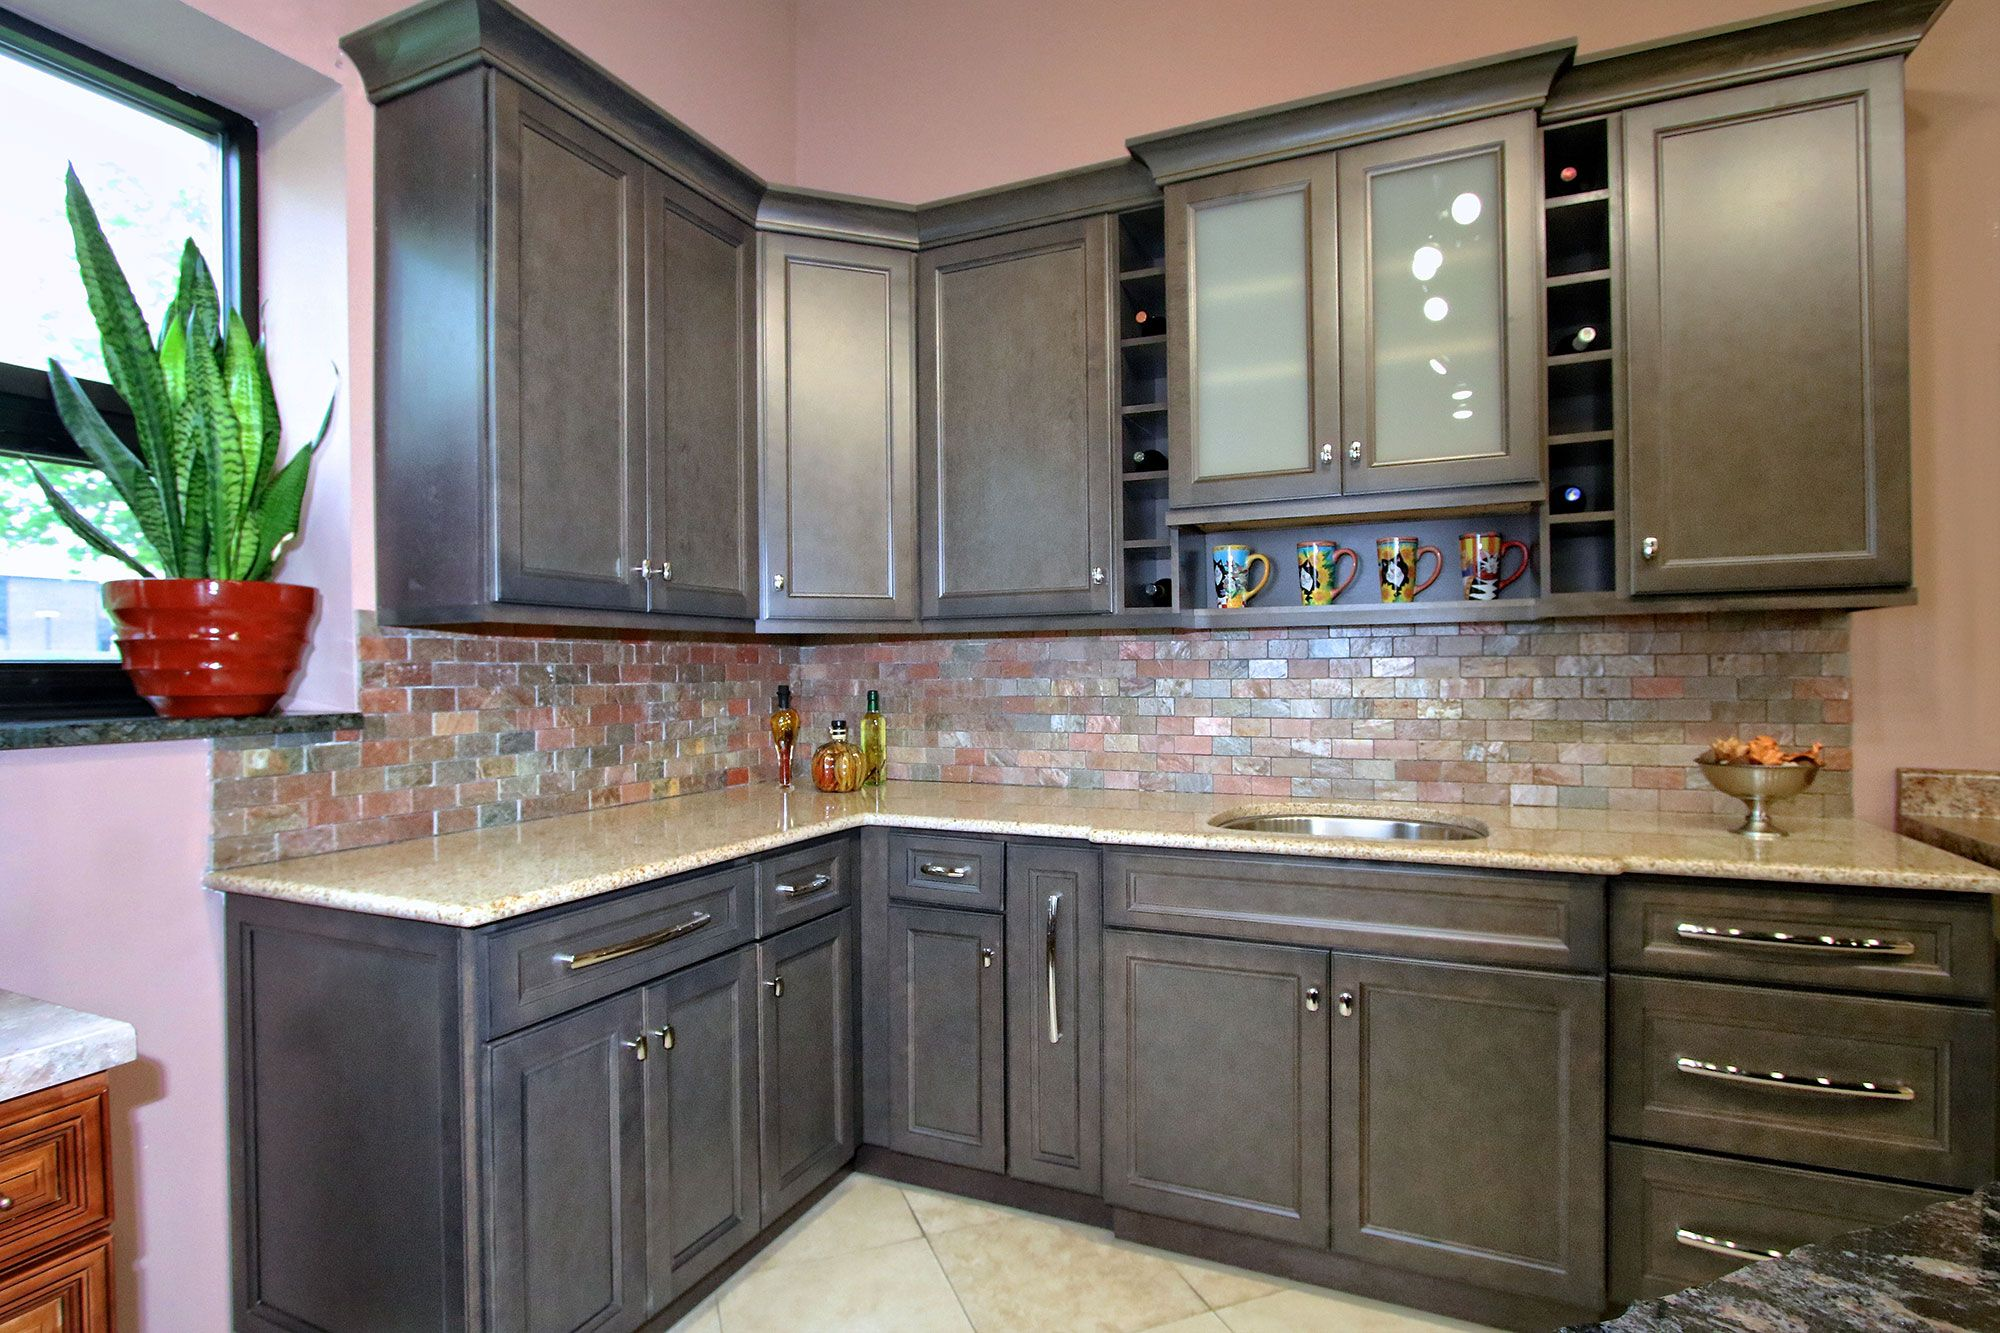 instock kitchen cabinets white drop in sink aspen wood stiock stock